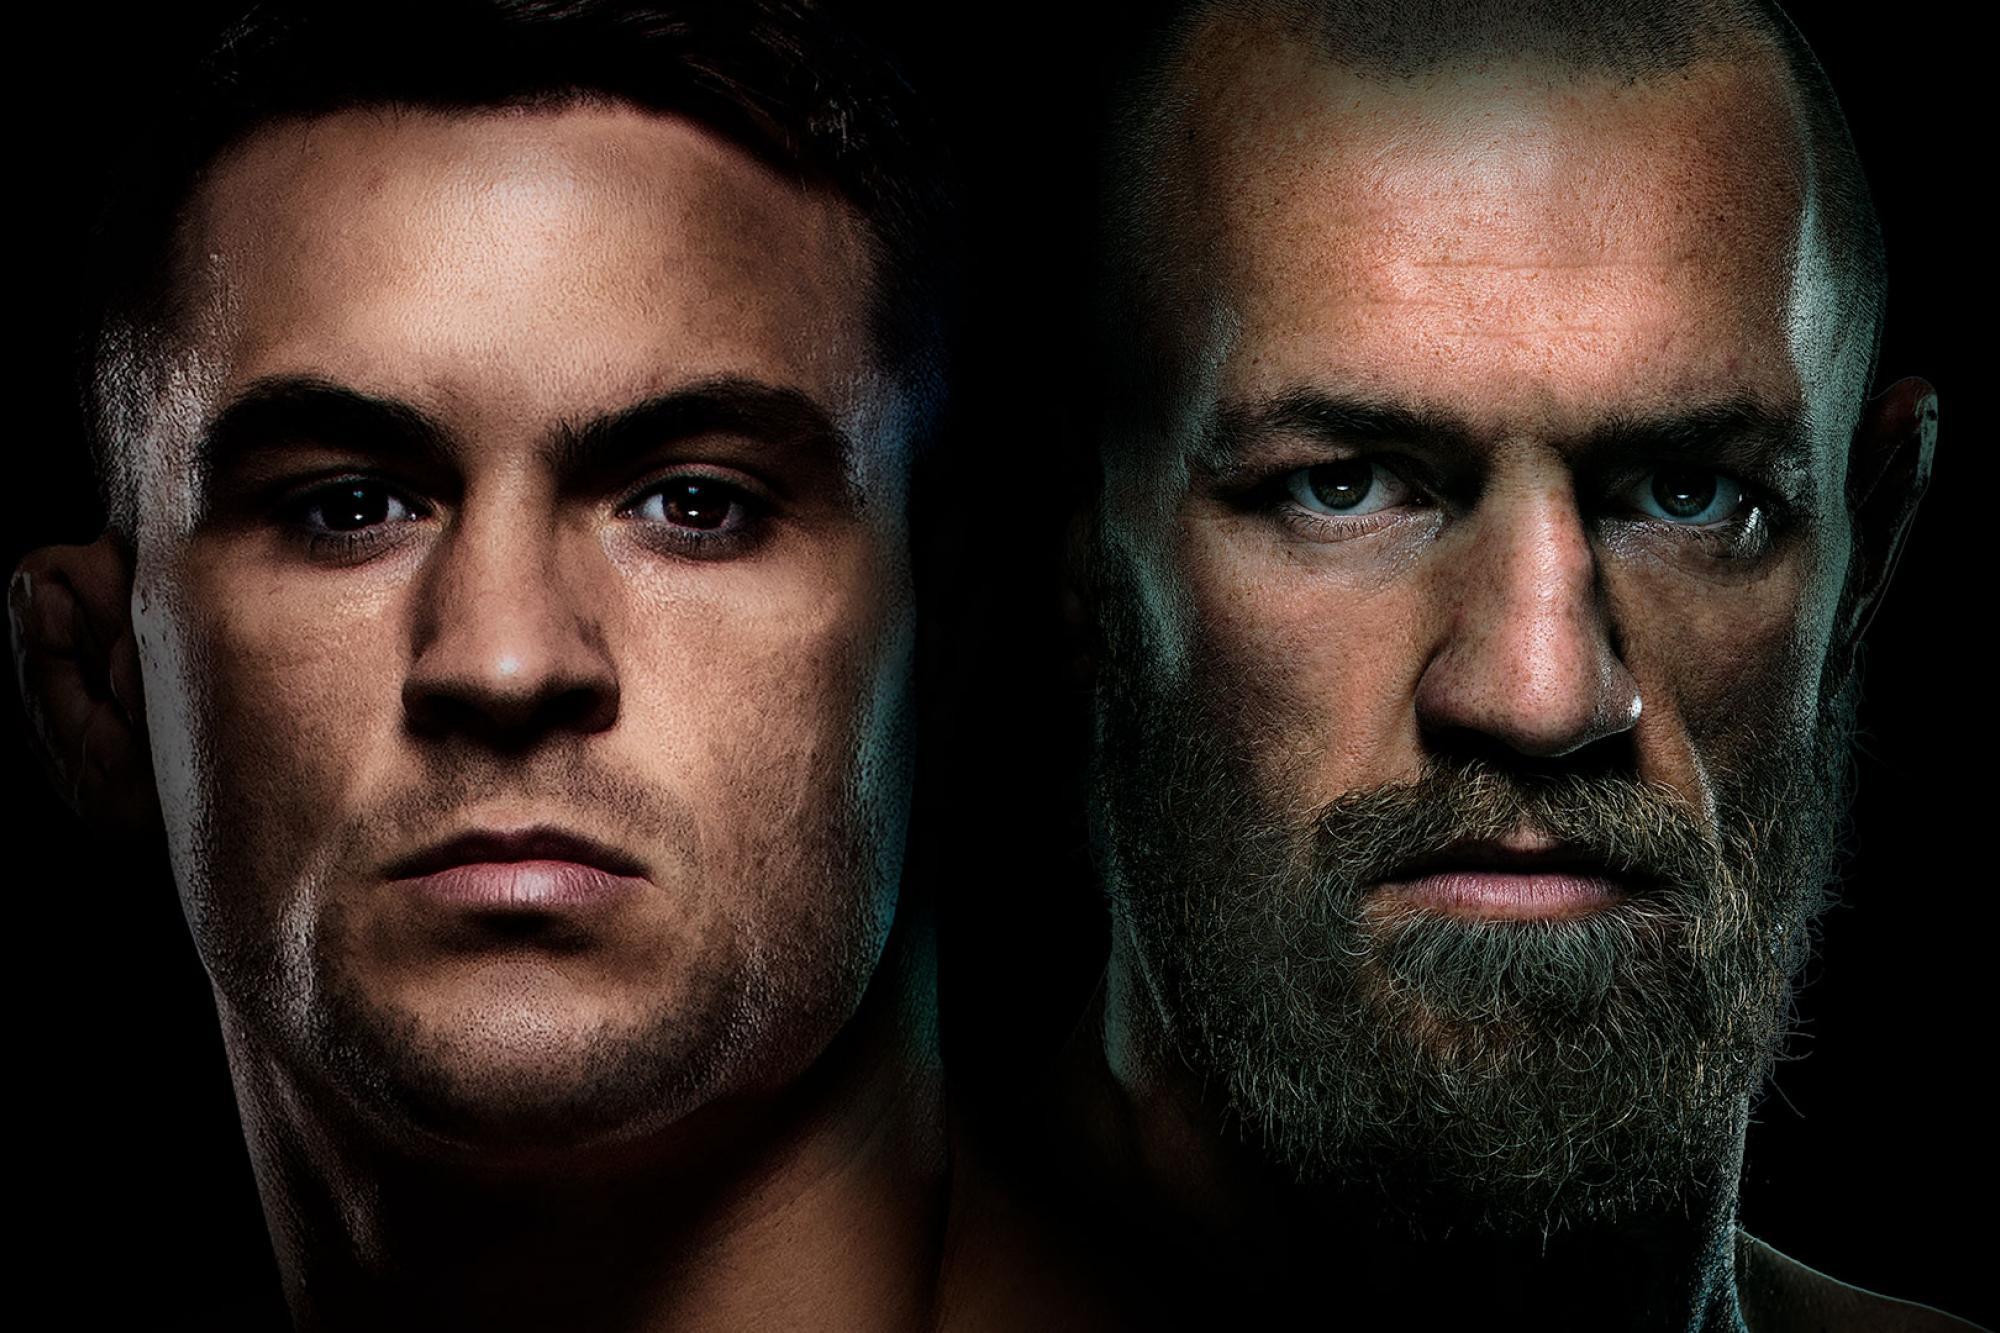 UFC 264 Dustin Poirier vs Conor McGregor 3